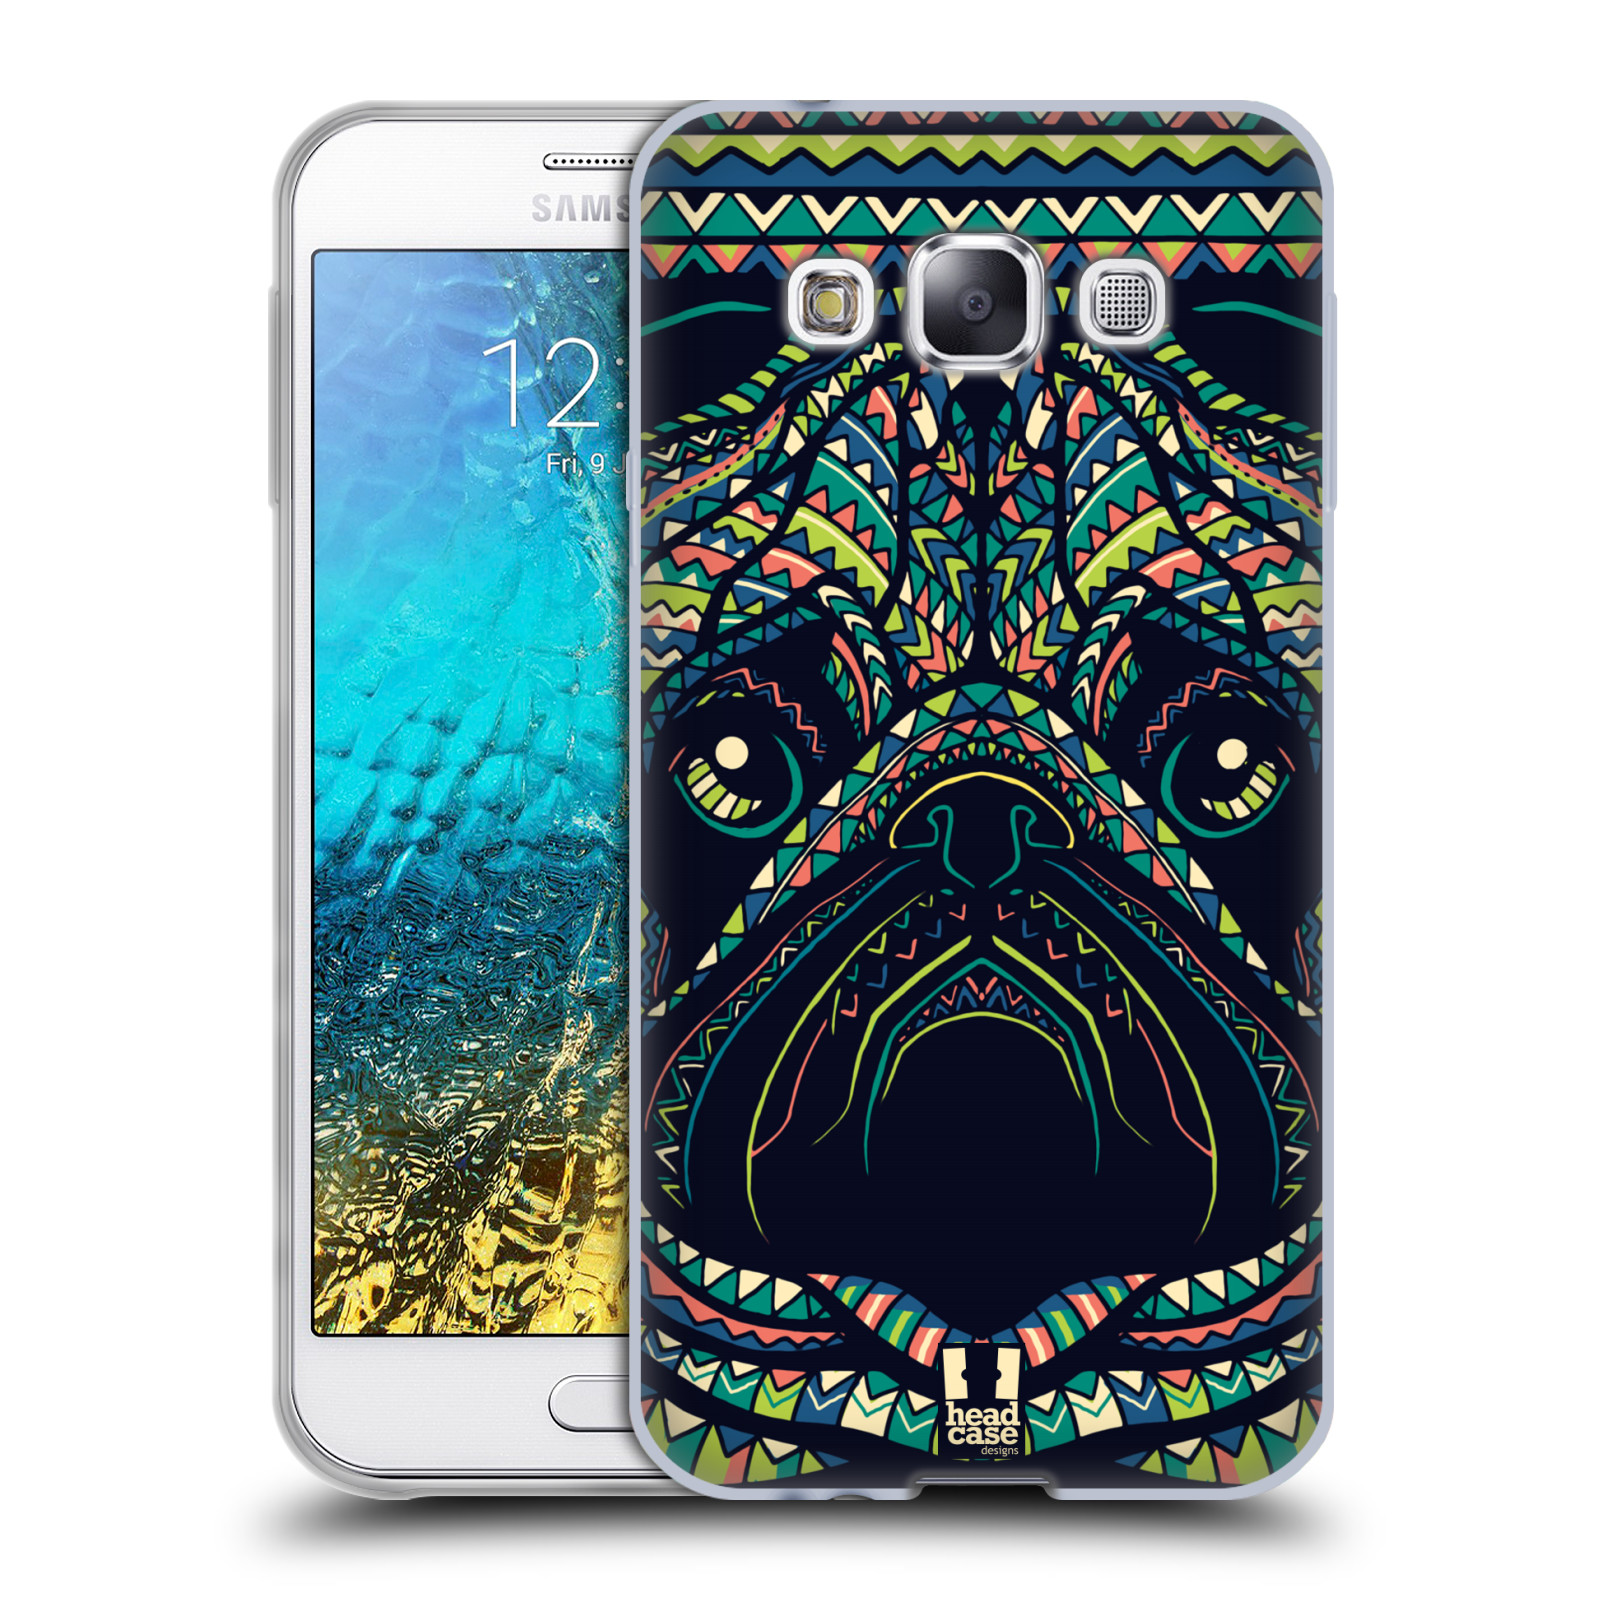 HEAD CASE silikonový obal na mobil Samsung Galaxy E5 vzor Aztécký motiv zvíře 3 mopsík